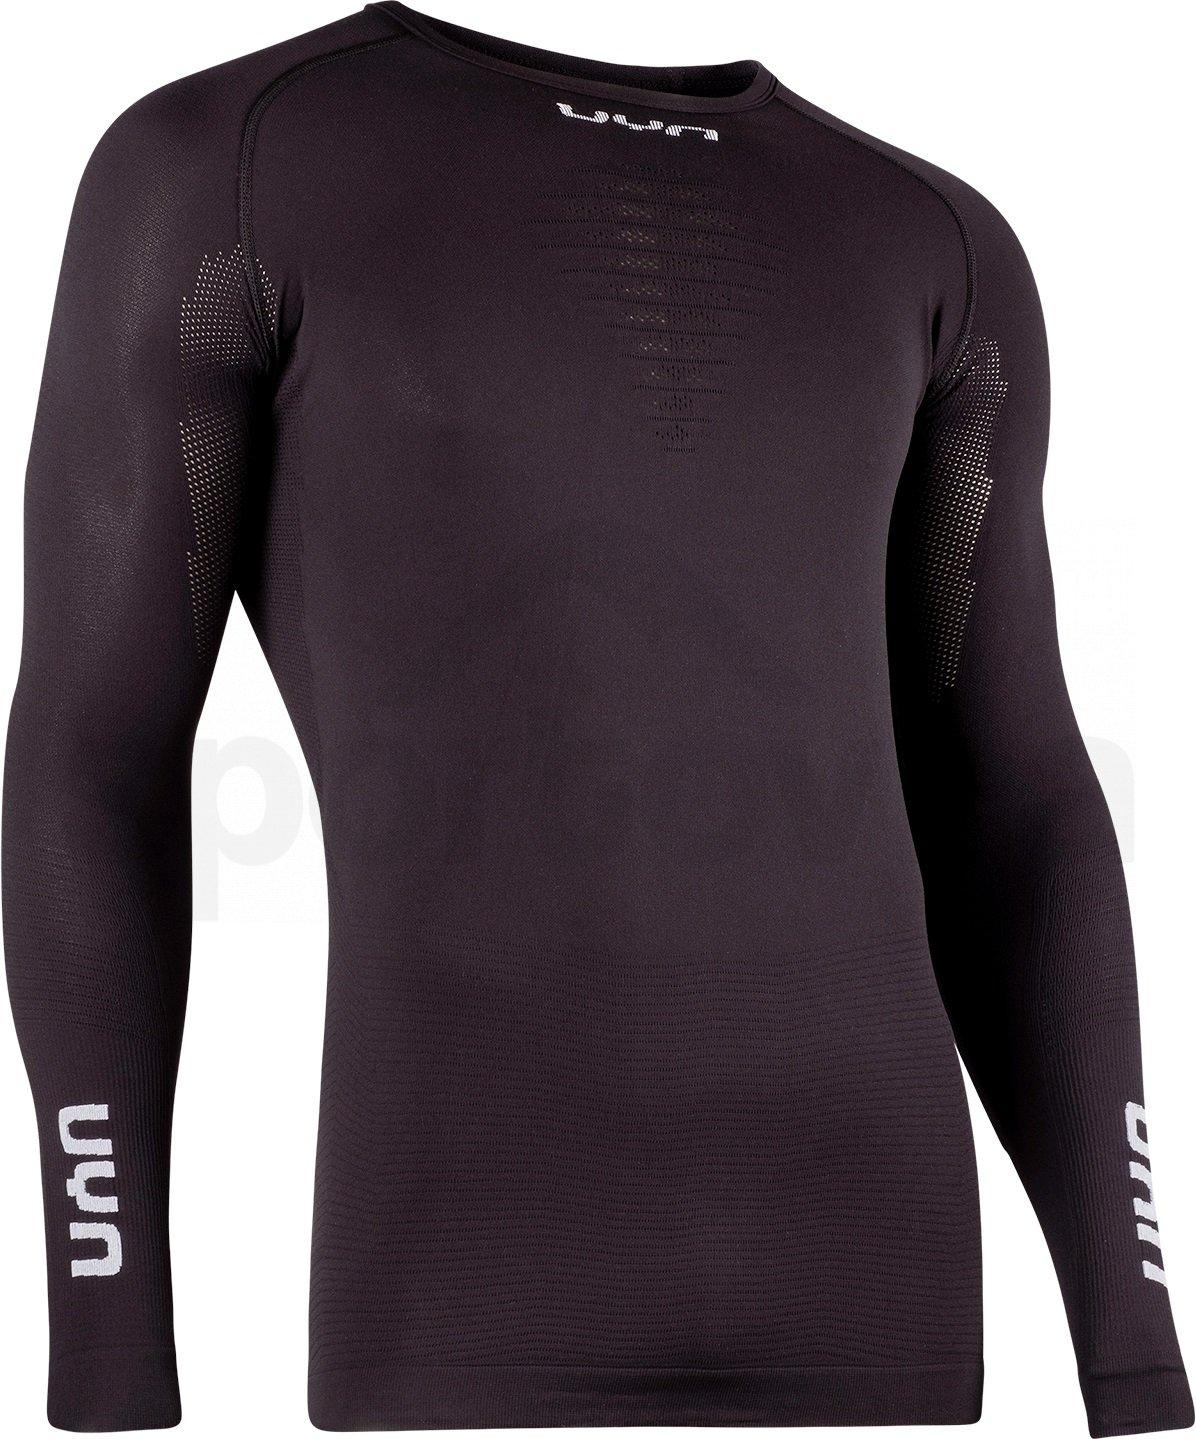 Tričko Uyn Energyon UW Shirt Long Sl. M - černá